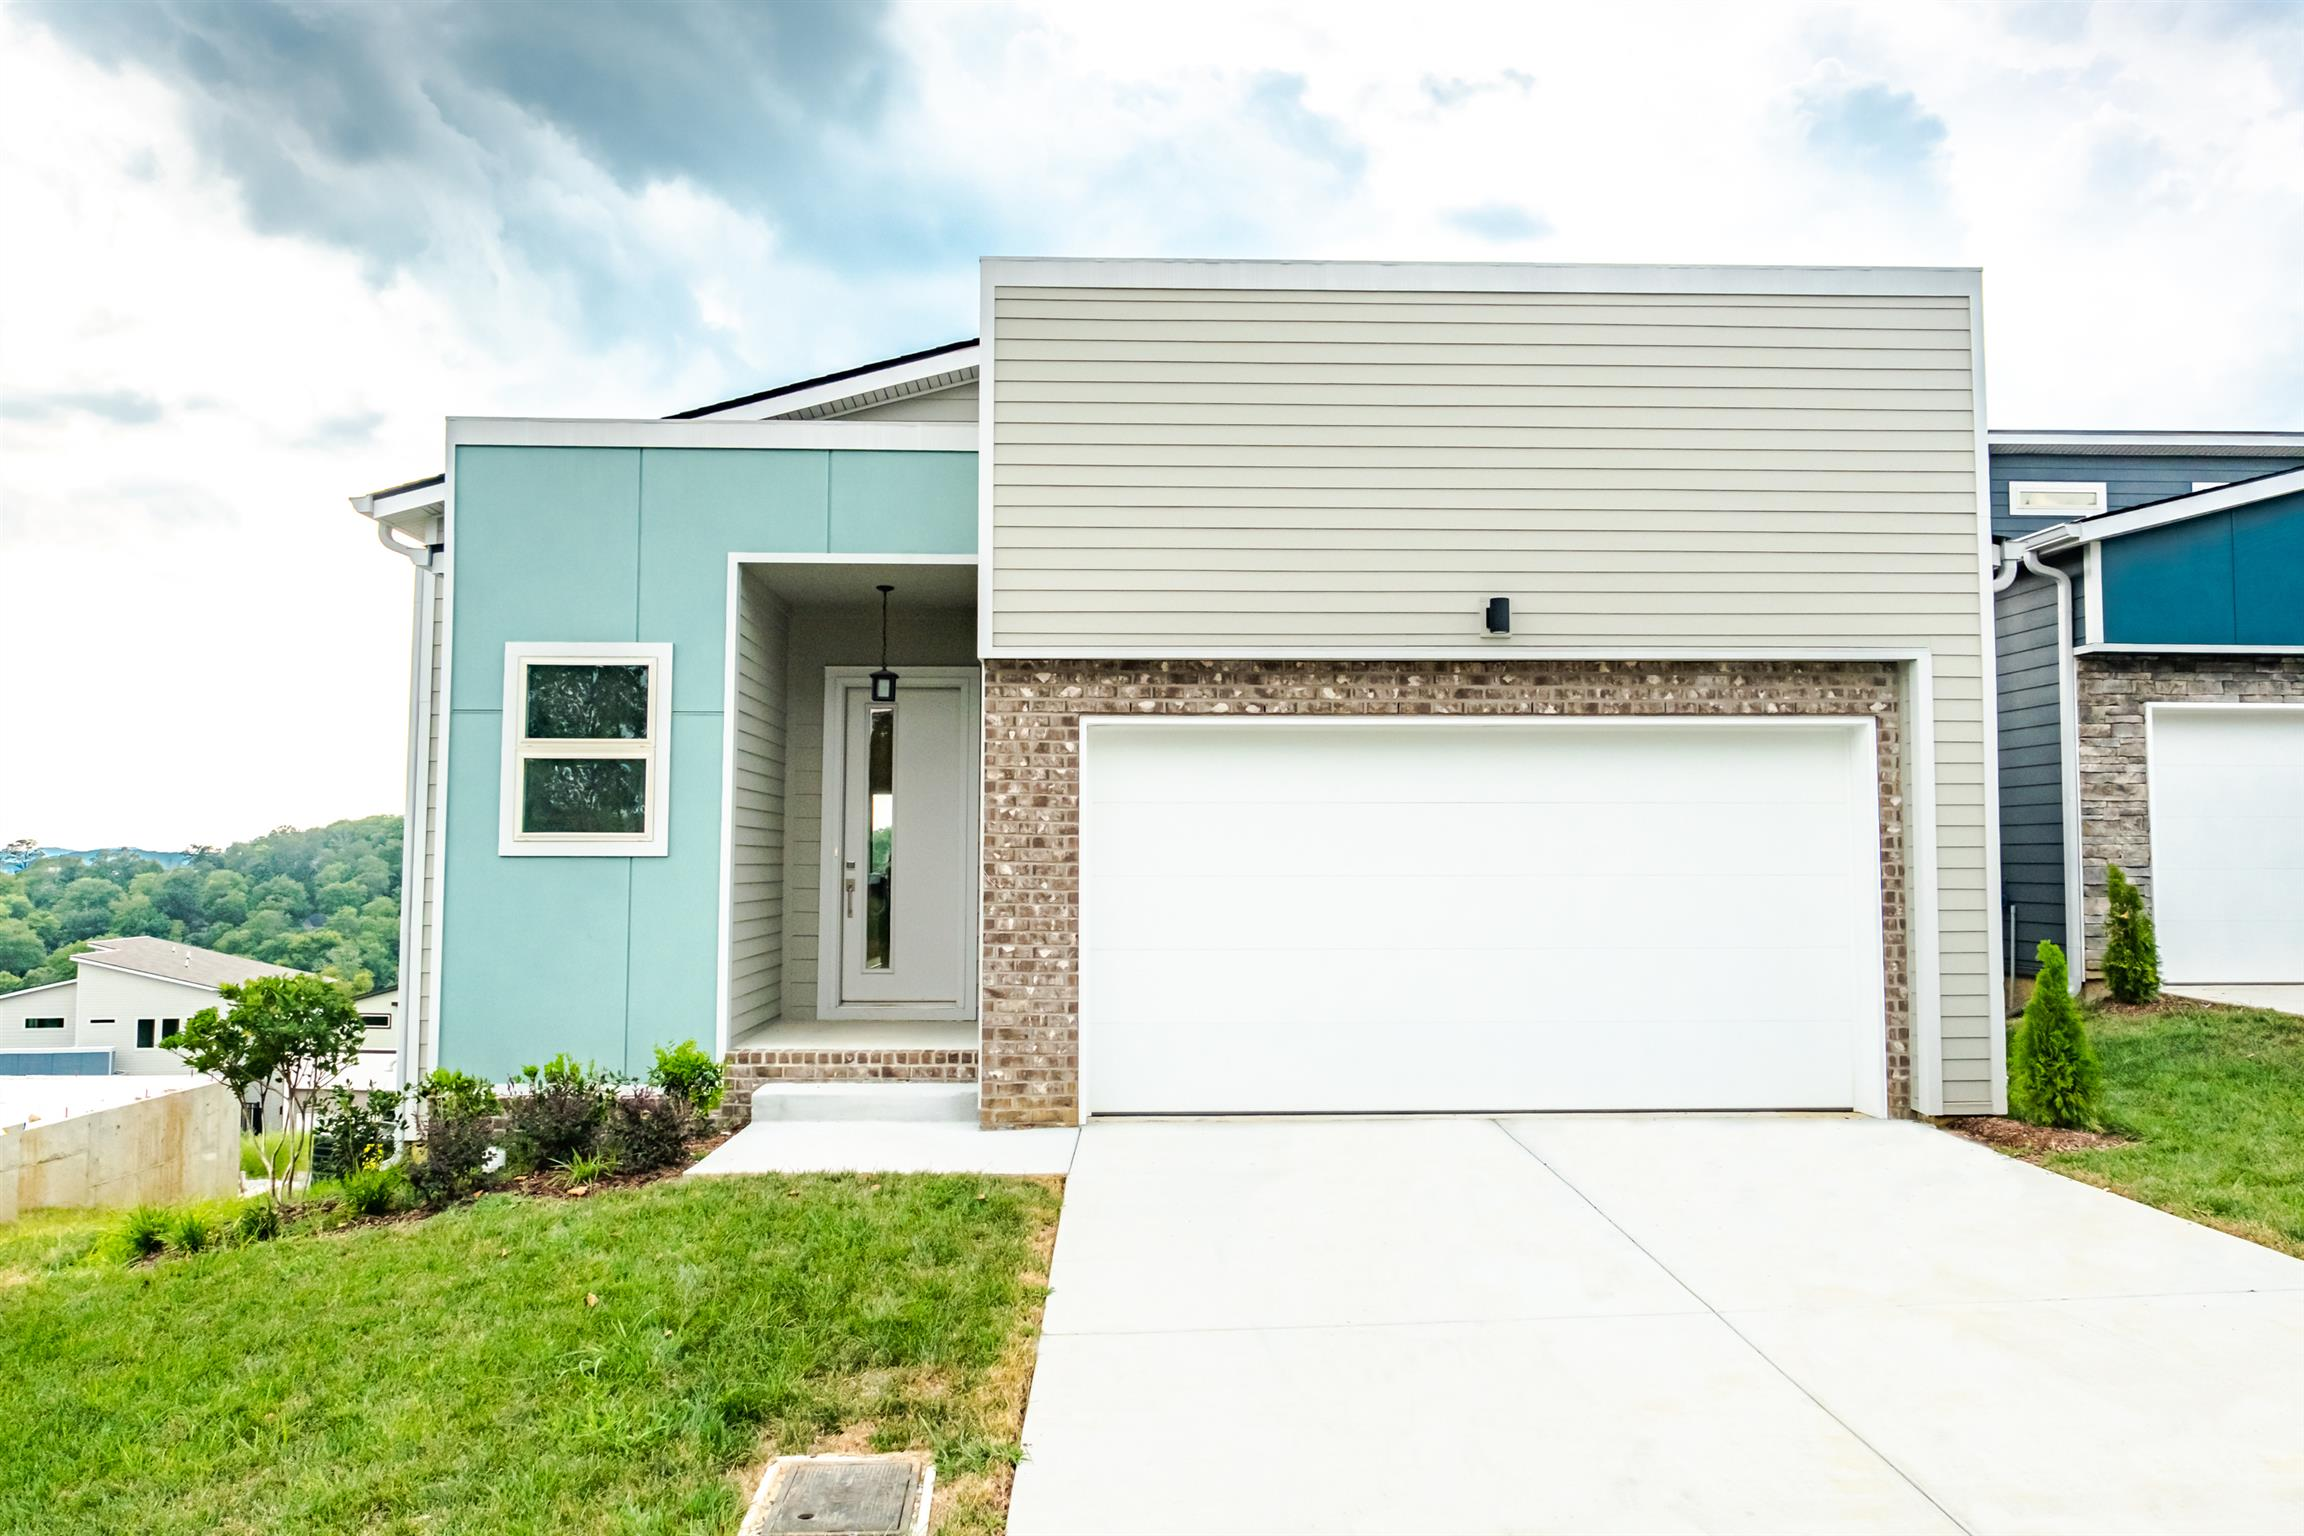 1749 Boxwood Dr. Lot 83, Nashville, TN 37211 - Nashville, TN real estate listing